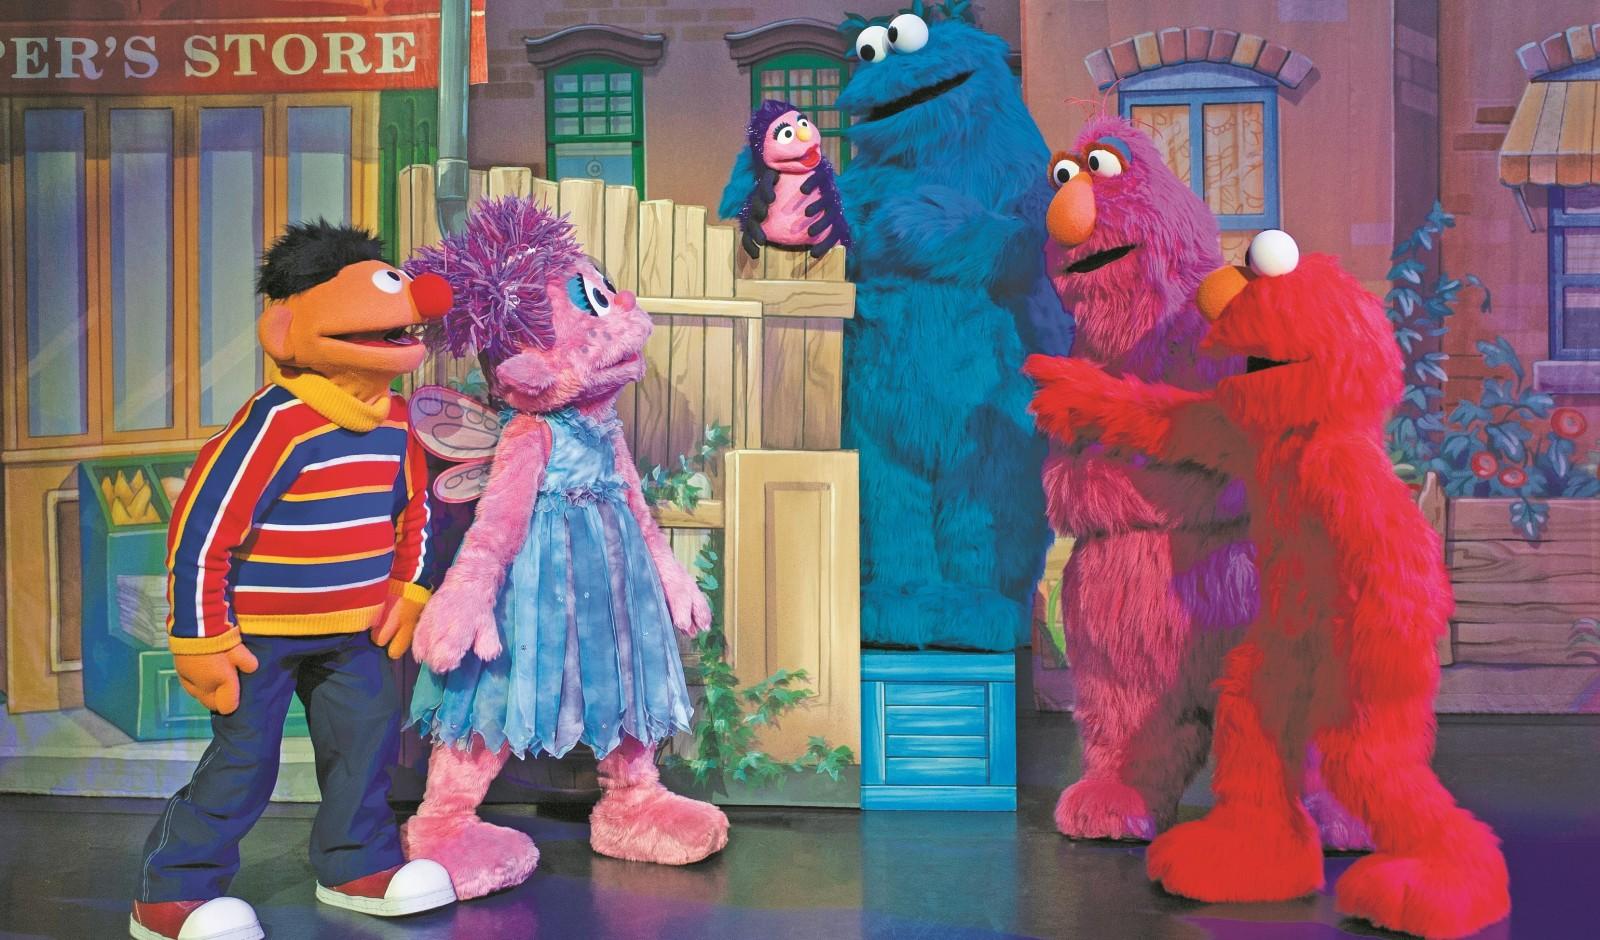 'Sesame Street' friends perform 'Itsy Bitsy Spider' during 'Sesame Street Live: Let's Dance!'